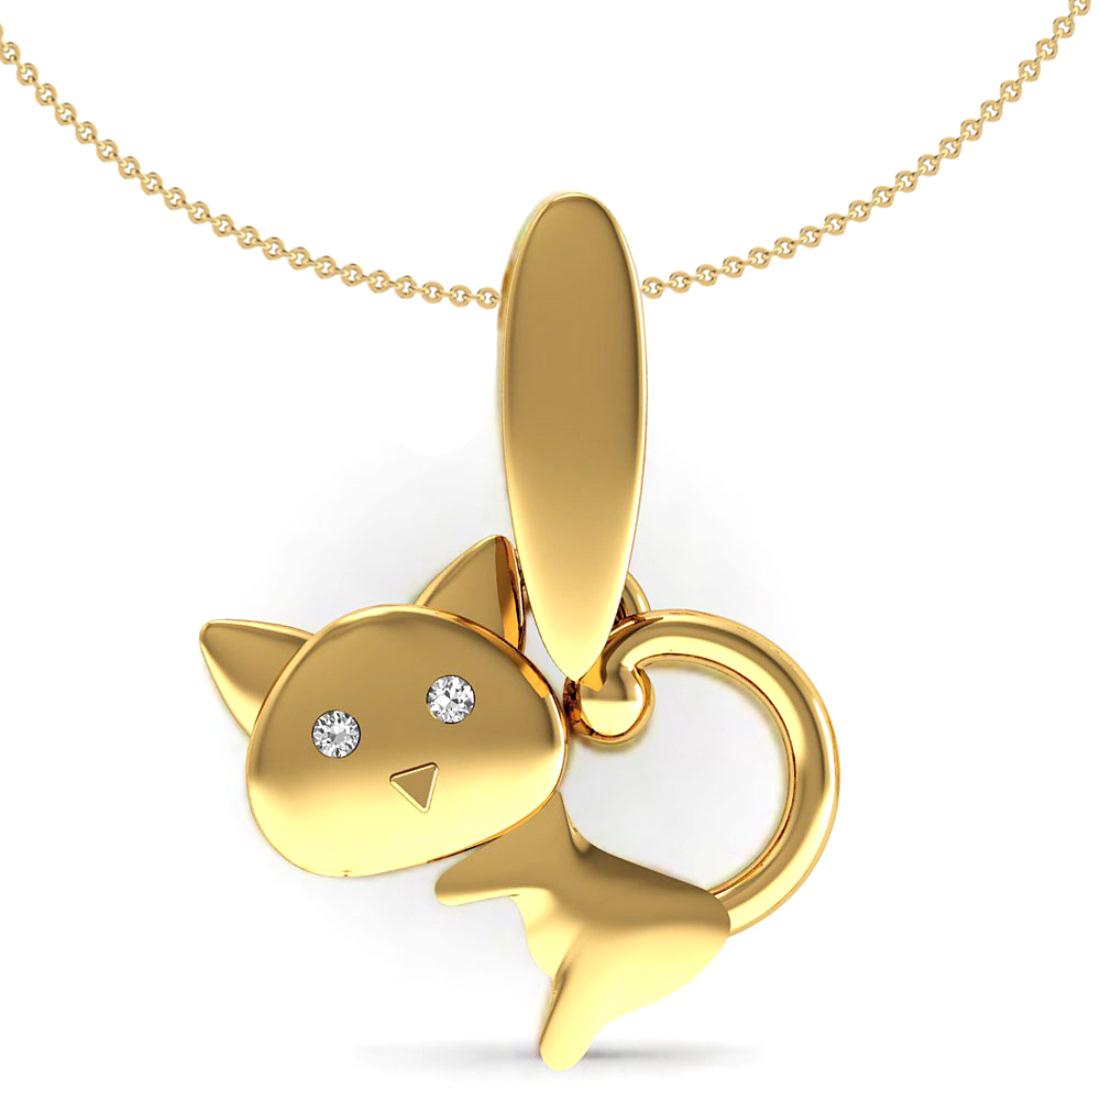 Natural Diamond eye cat shape kids pendant with chain, 18k Gold jewelry